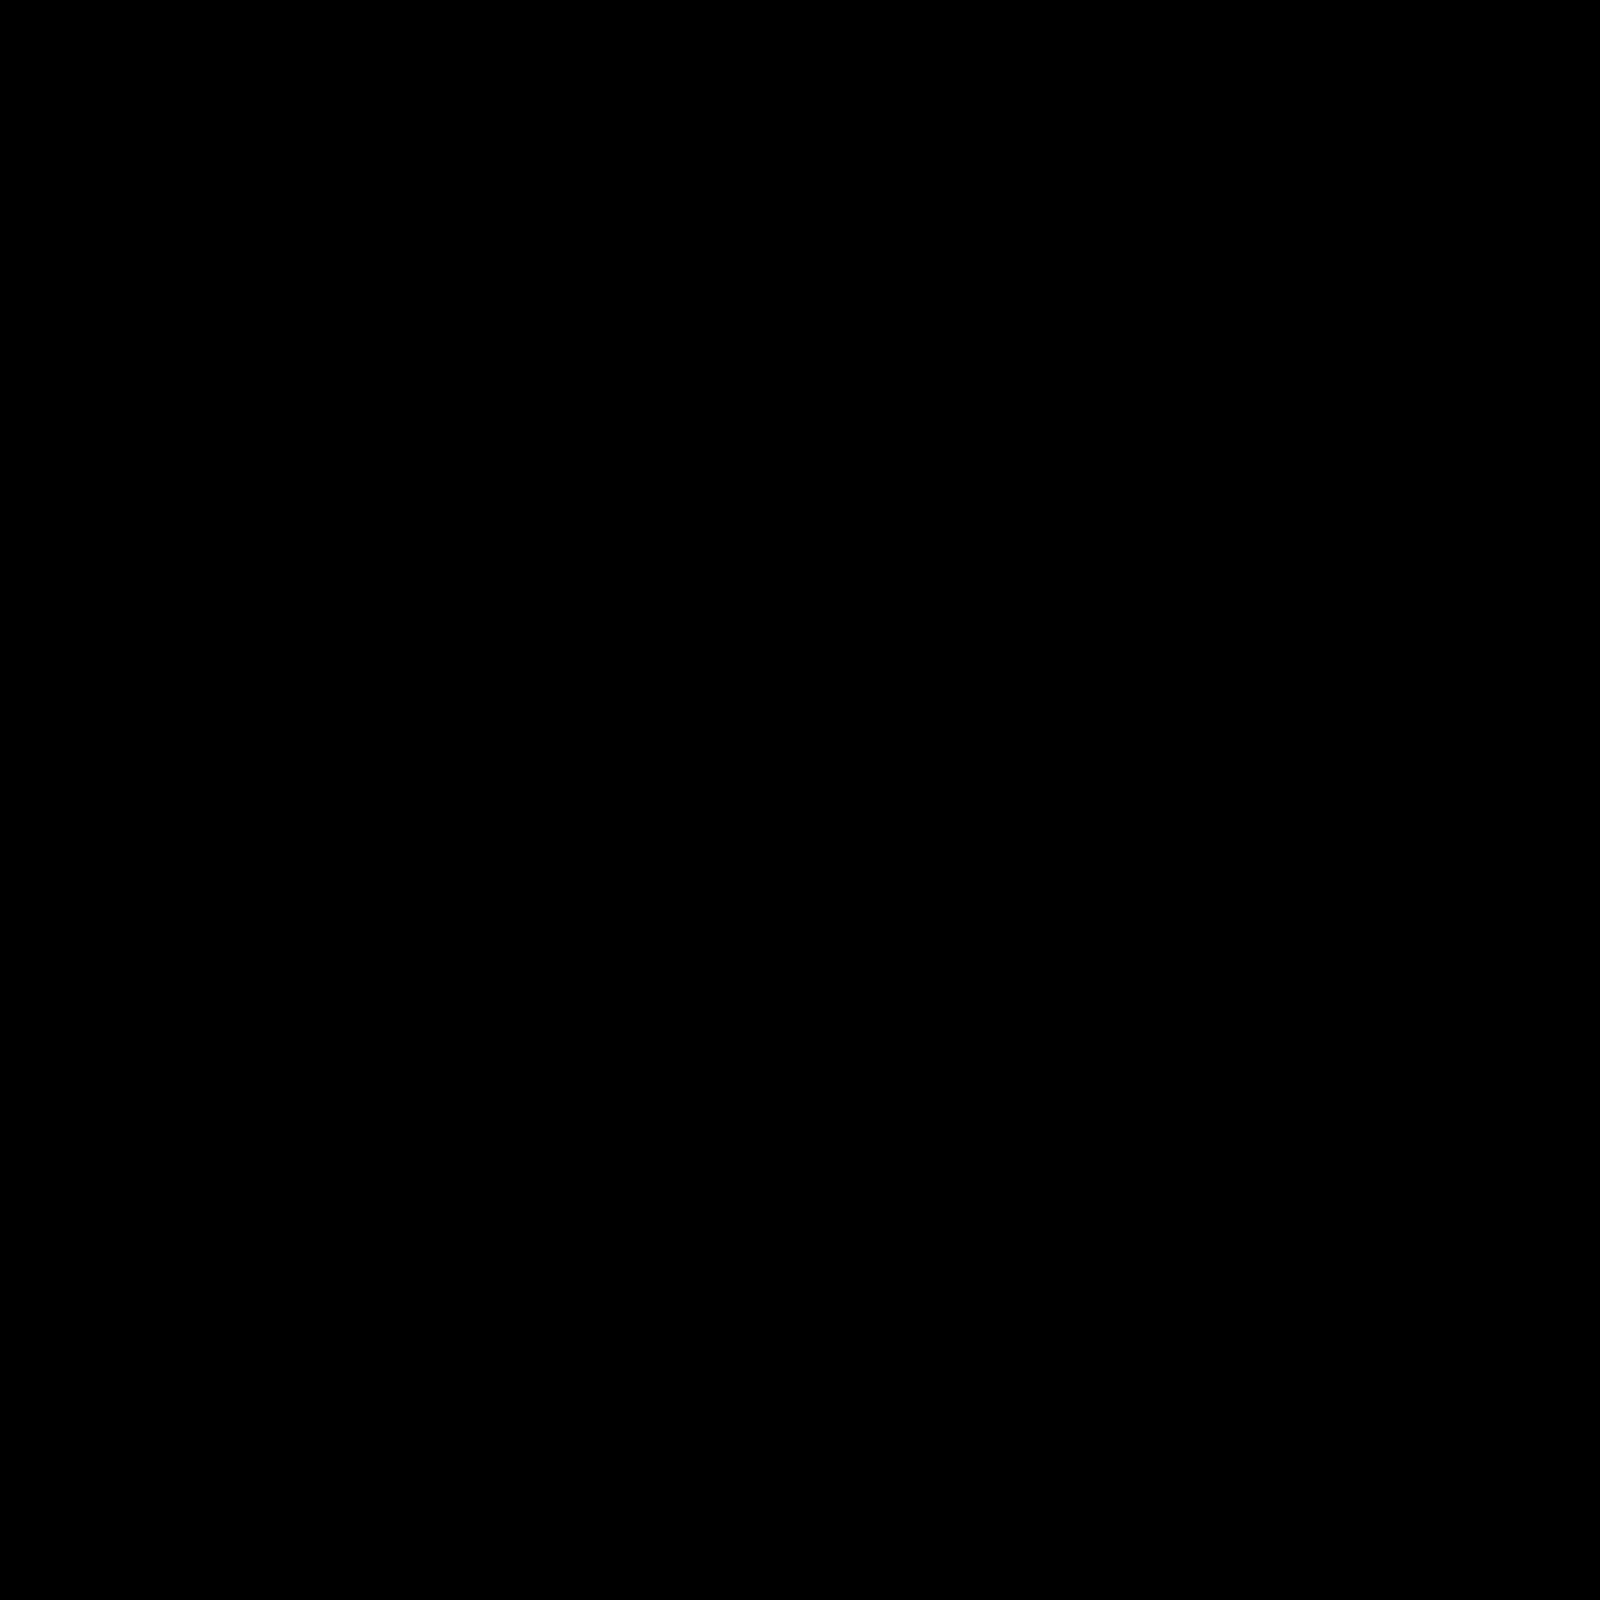 Ringer Volume icon